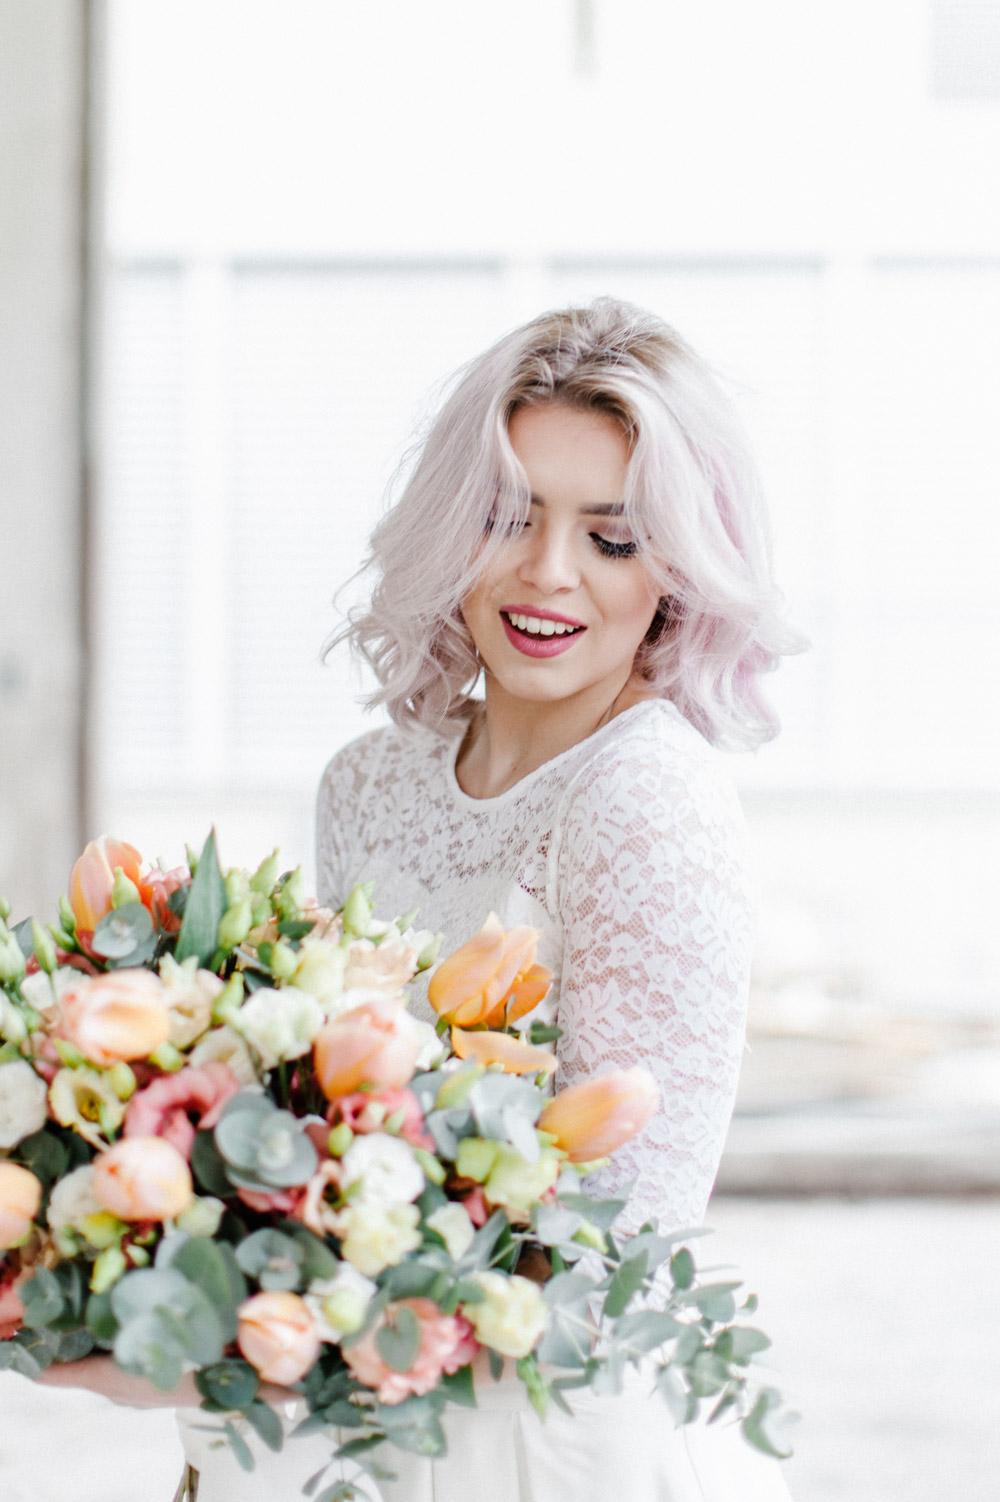 david-and-kathrin-wedding-bridal-inspiration-bern-switzerland-hochzeitsfotograf-059